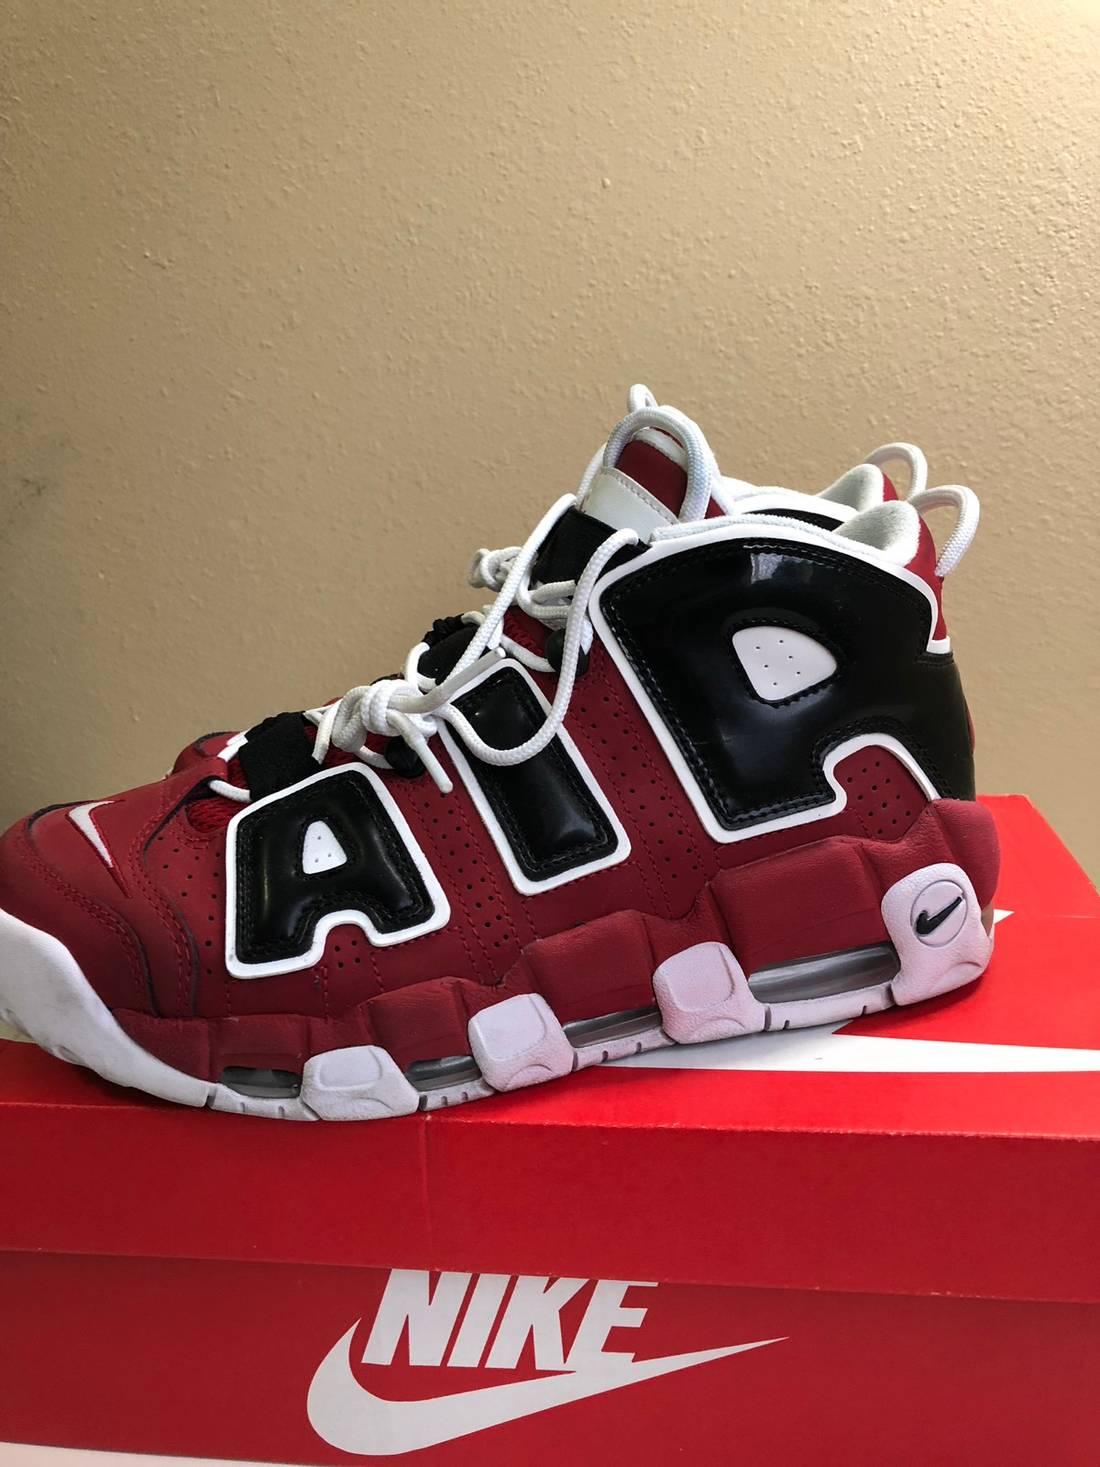 Nike Nike Uptempo Christmas Bulls Pack Size 8.5 - Hi-Top Sneakers ...